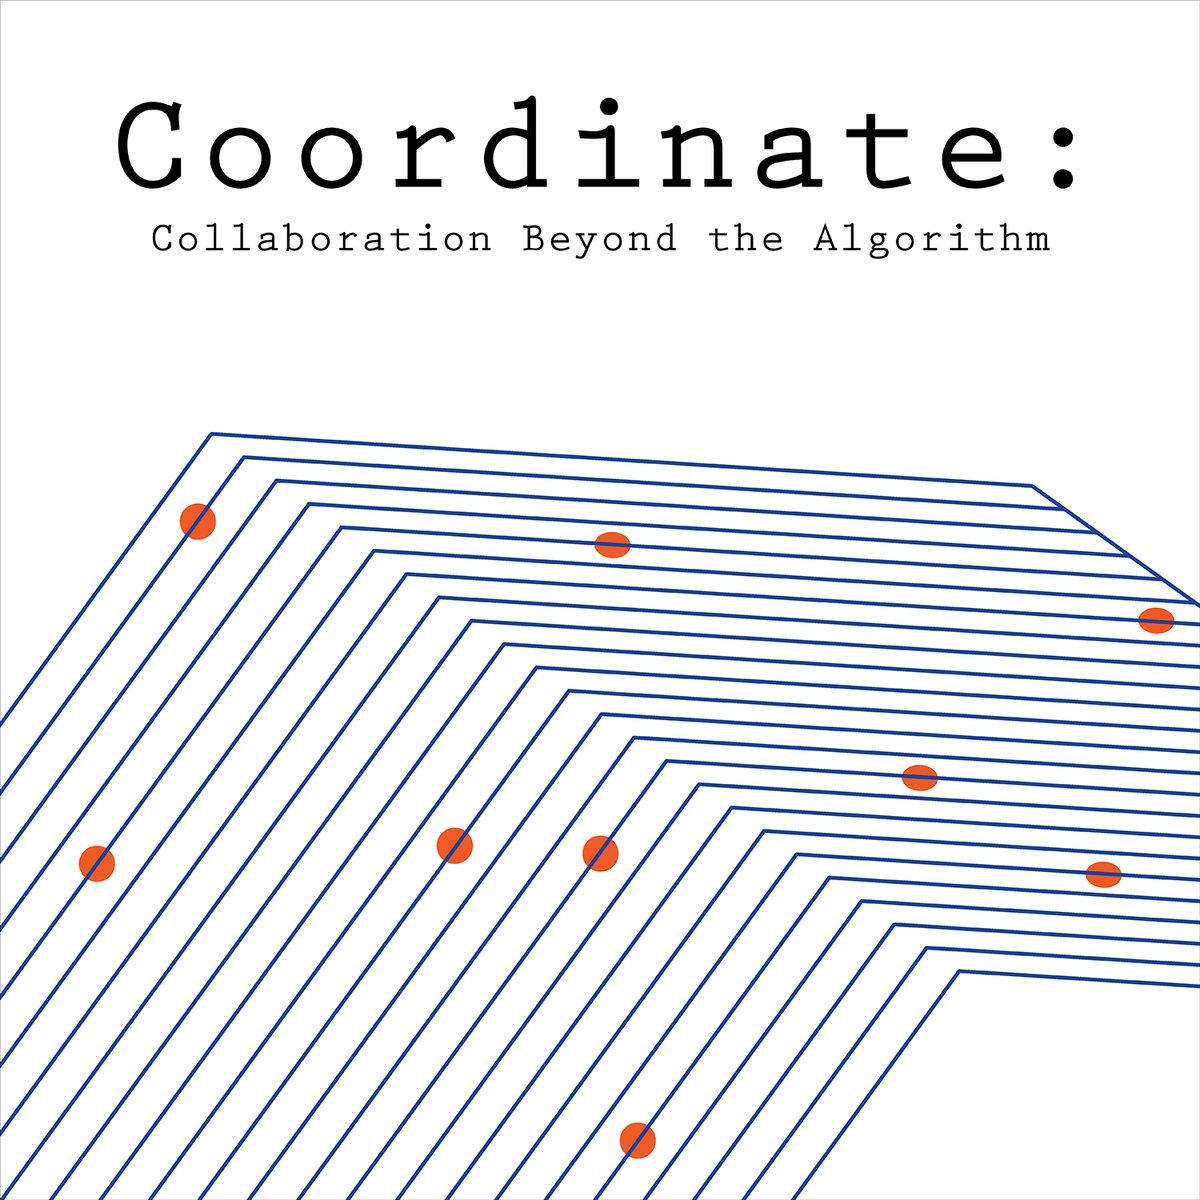 https://clananalogue.bandcamp.com/album/coordinate-collaboration-beyond-the-algorithm